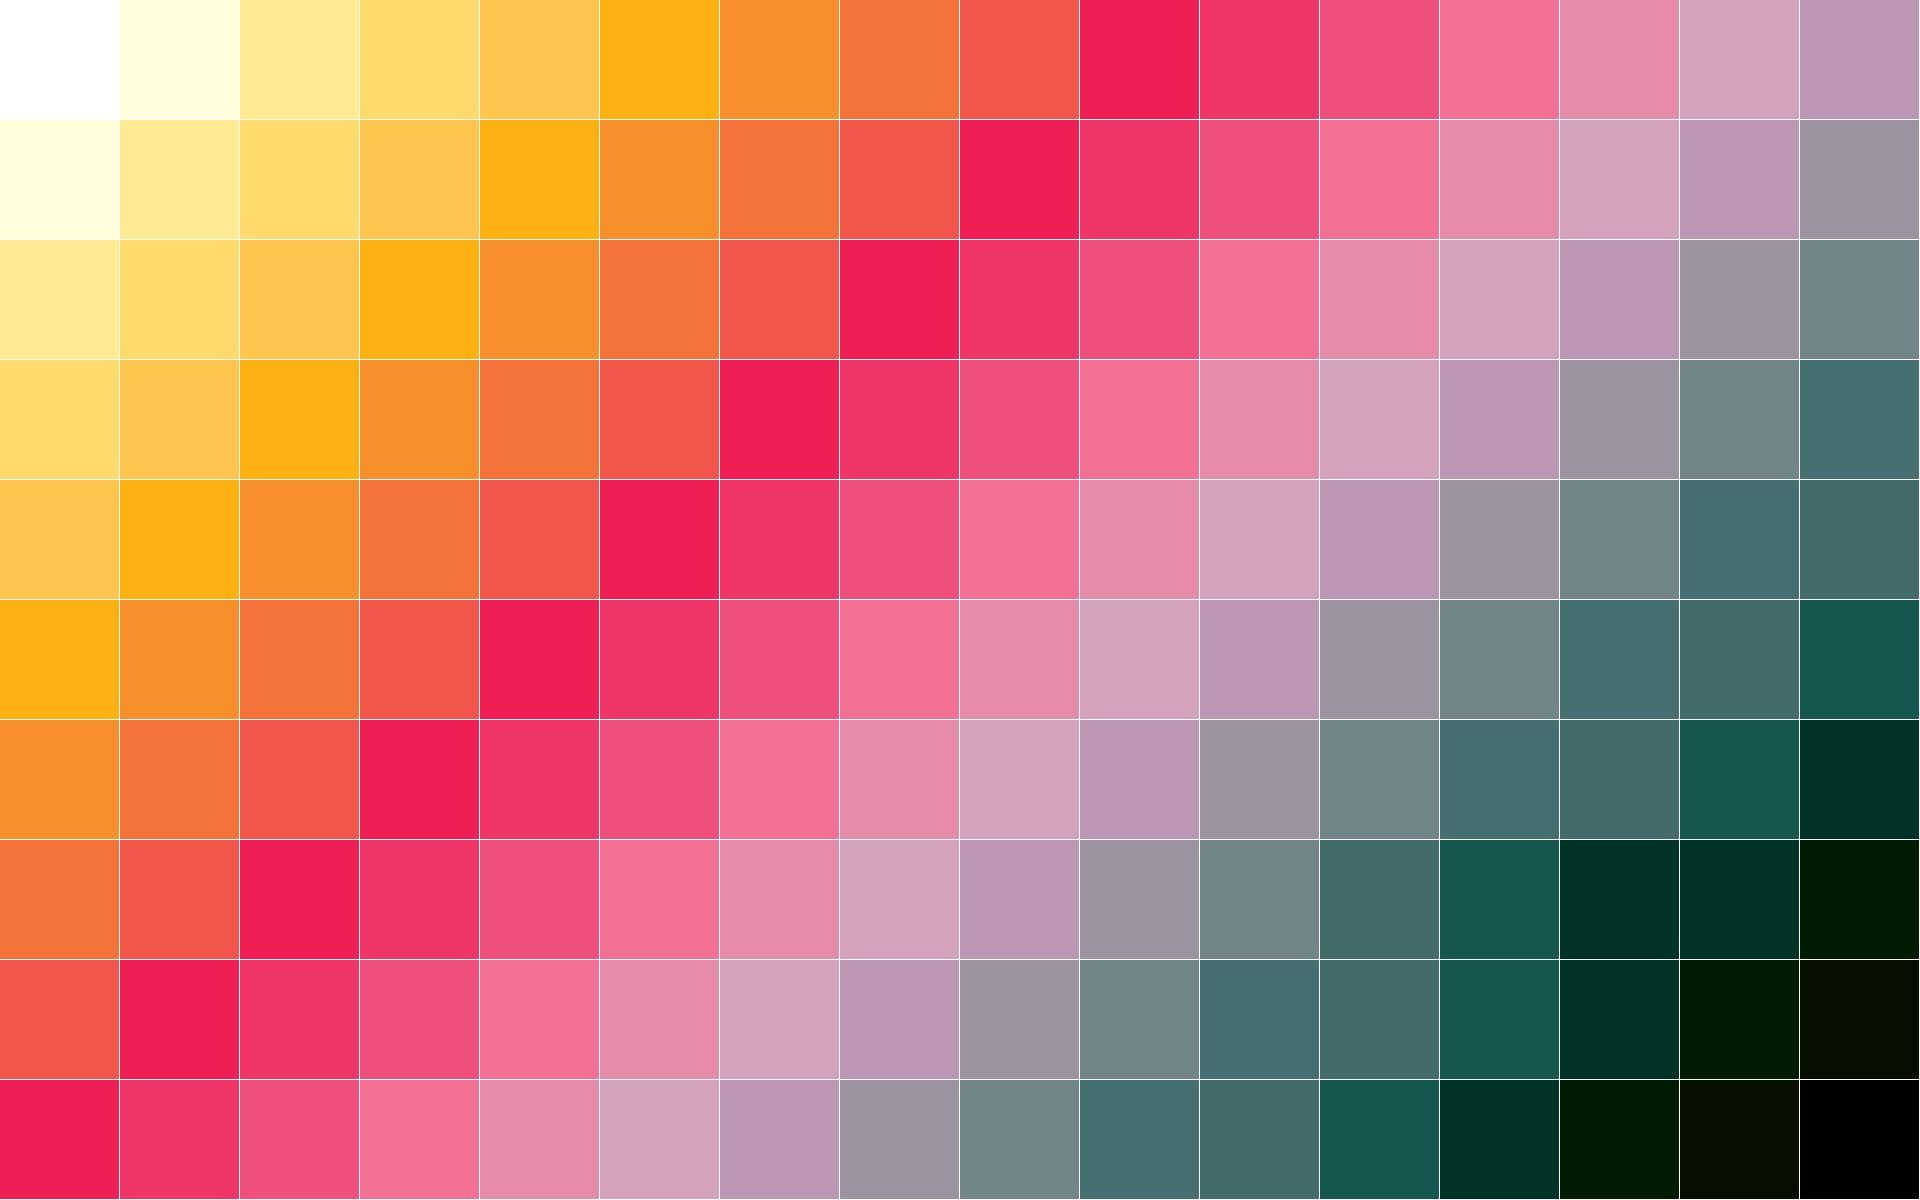 D Graphics Color Squares | Free Images at Clker.com - vector clip ...